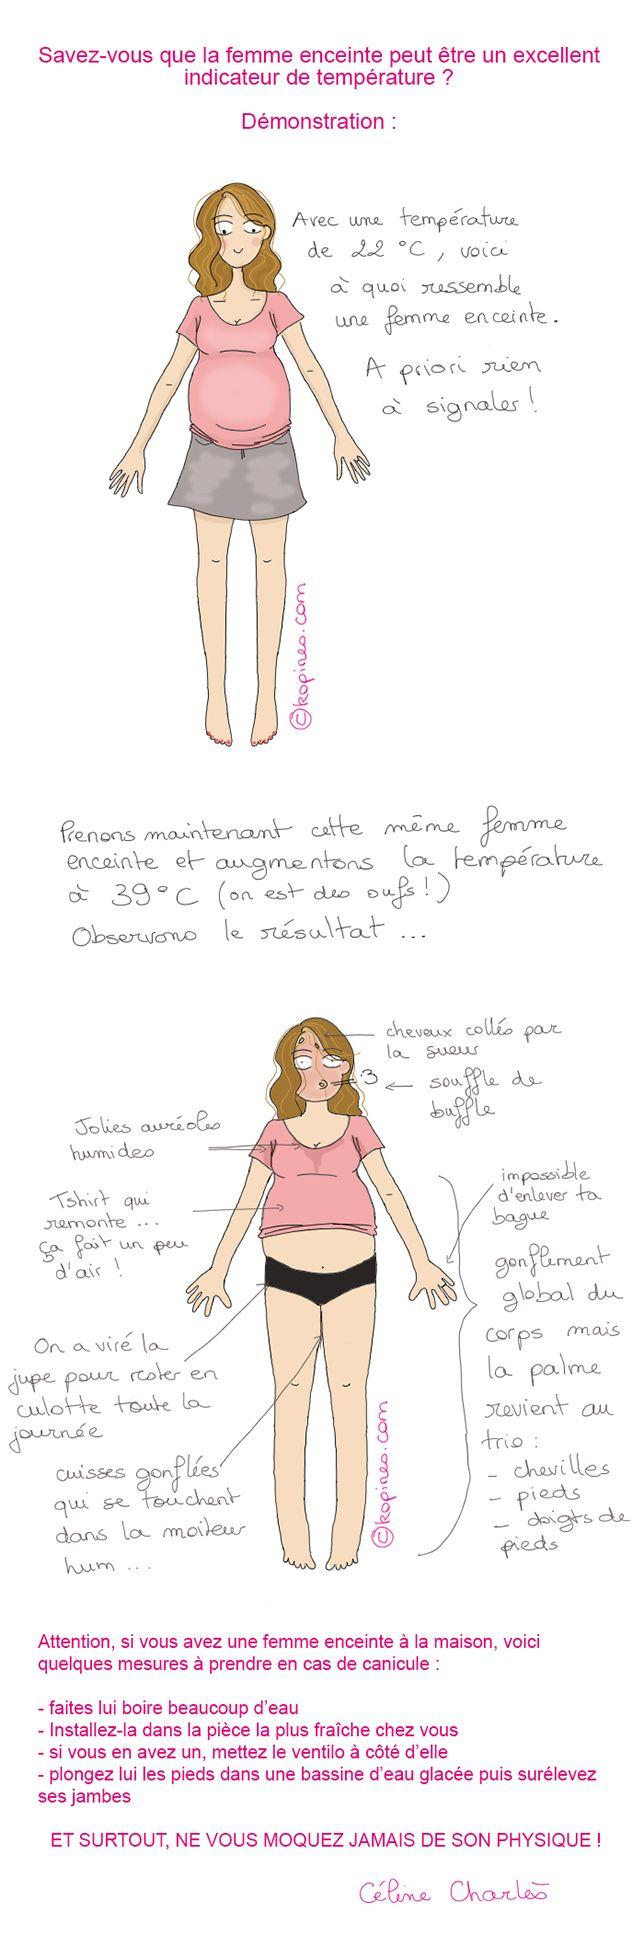 femme enceinte et canicule #humour #grossesse #femmeenceinte